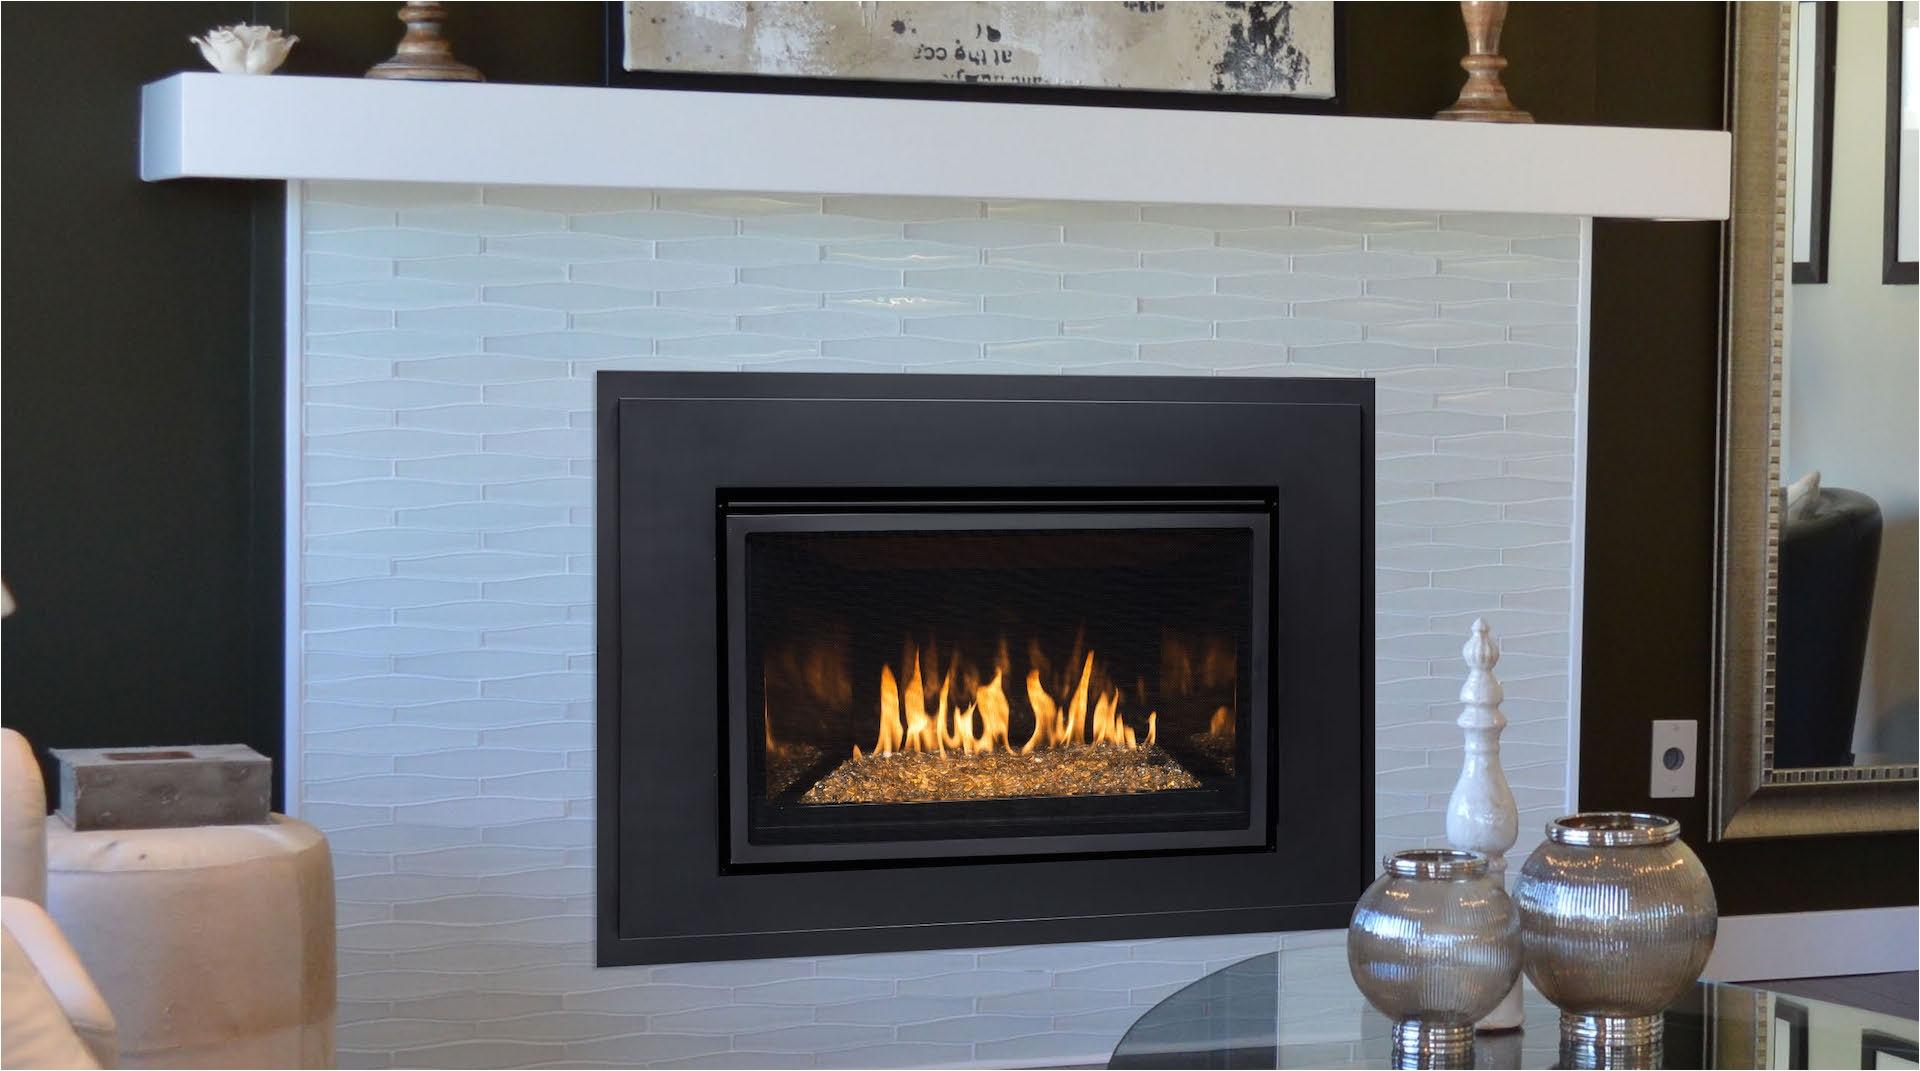 montigo 34fid fireplace gas insert full